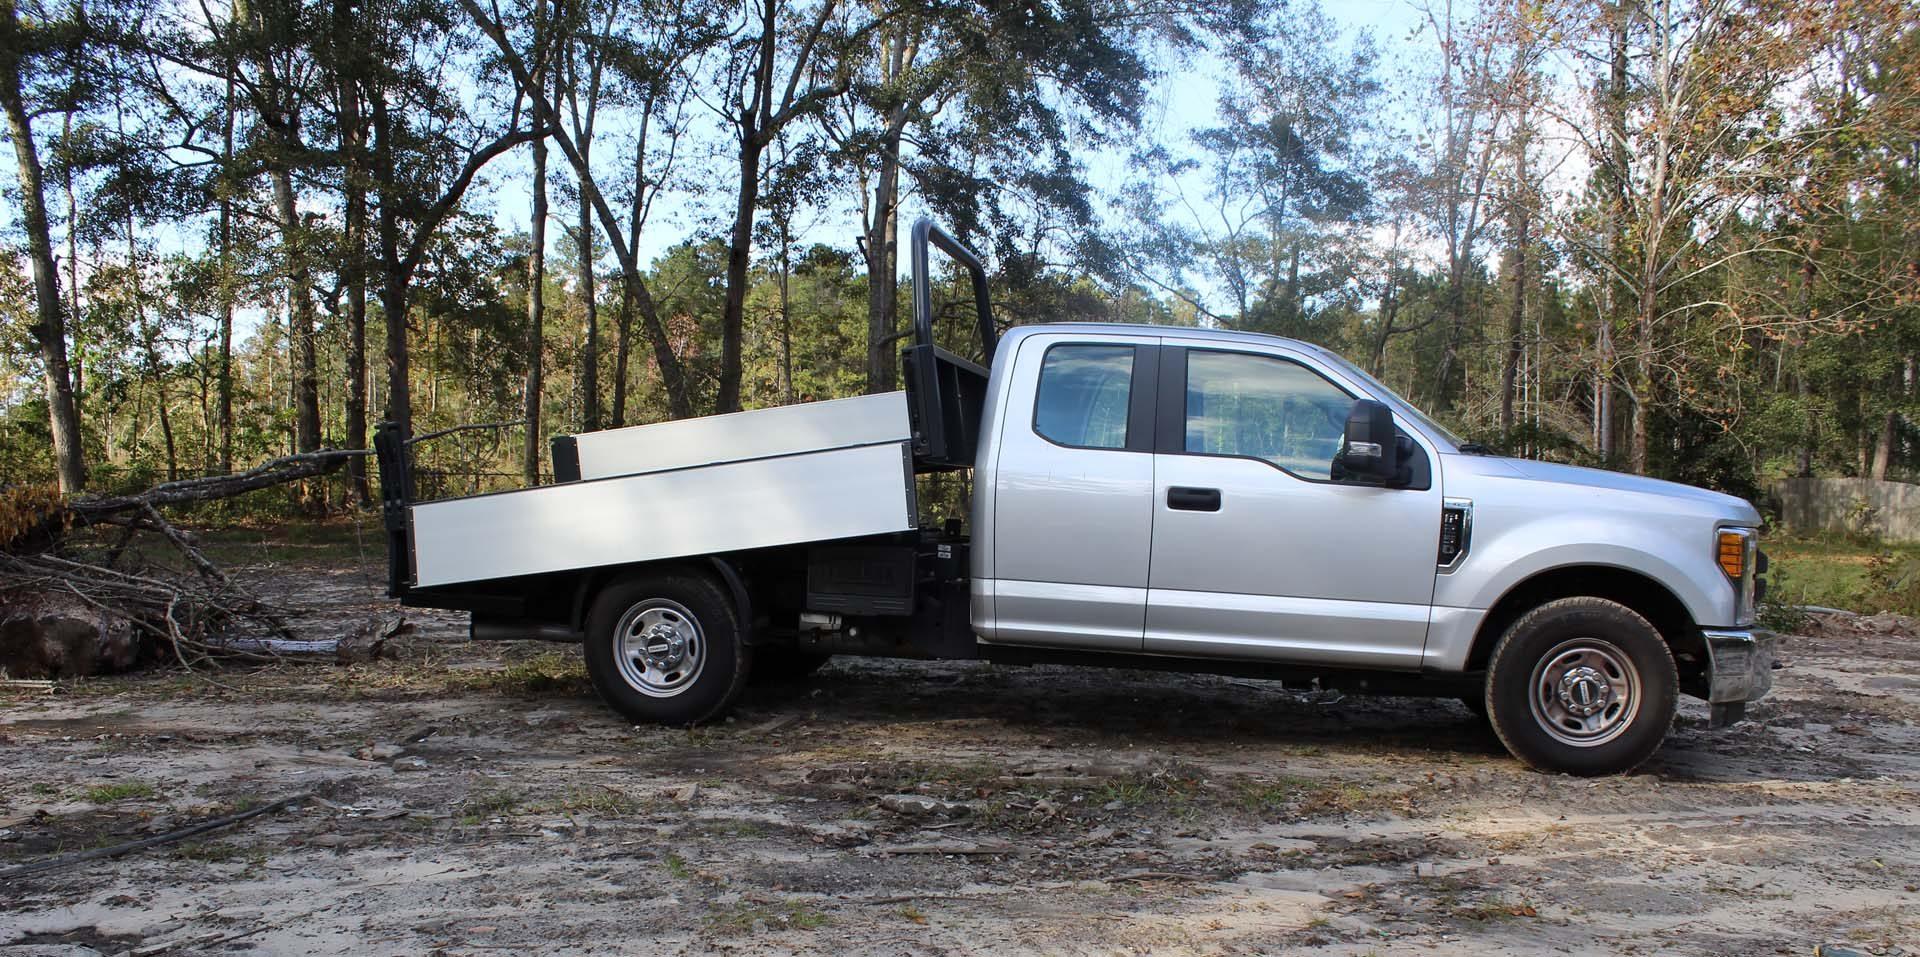 Medium Duty Flatbed And Tipper Trucks